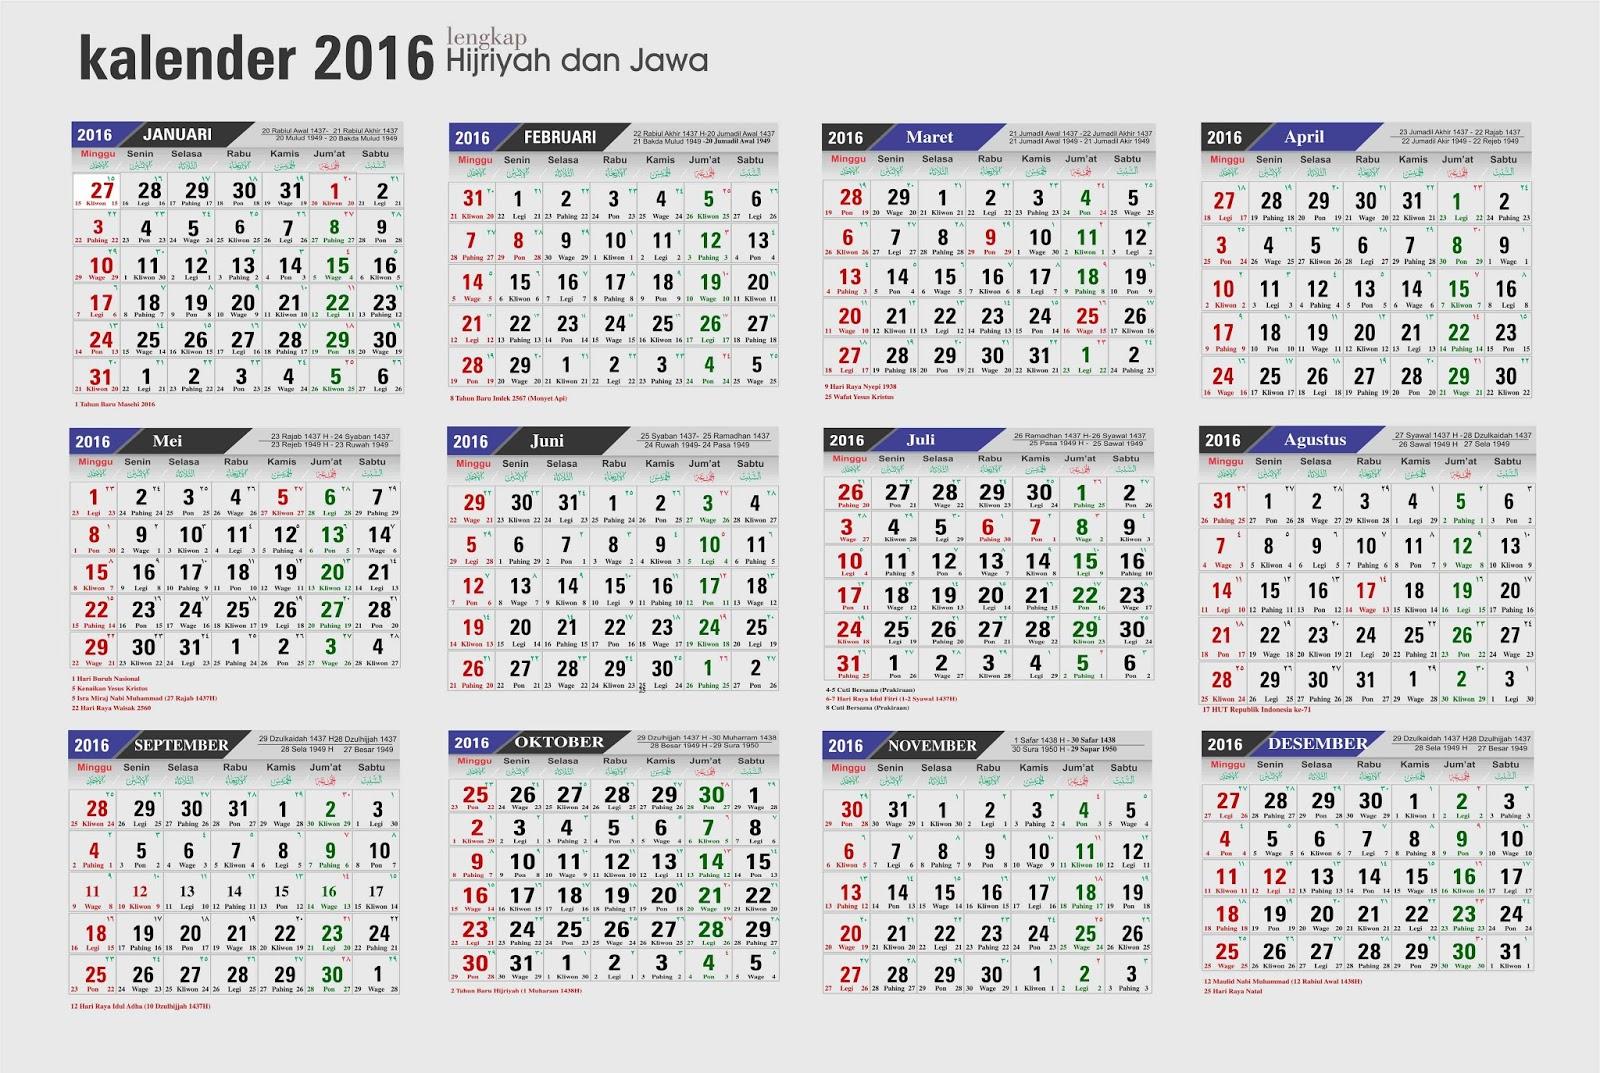 kalender 2016 hijriyah dan jawa the 2016 calendar is devoted to the